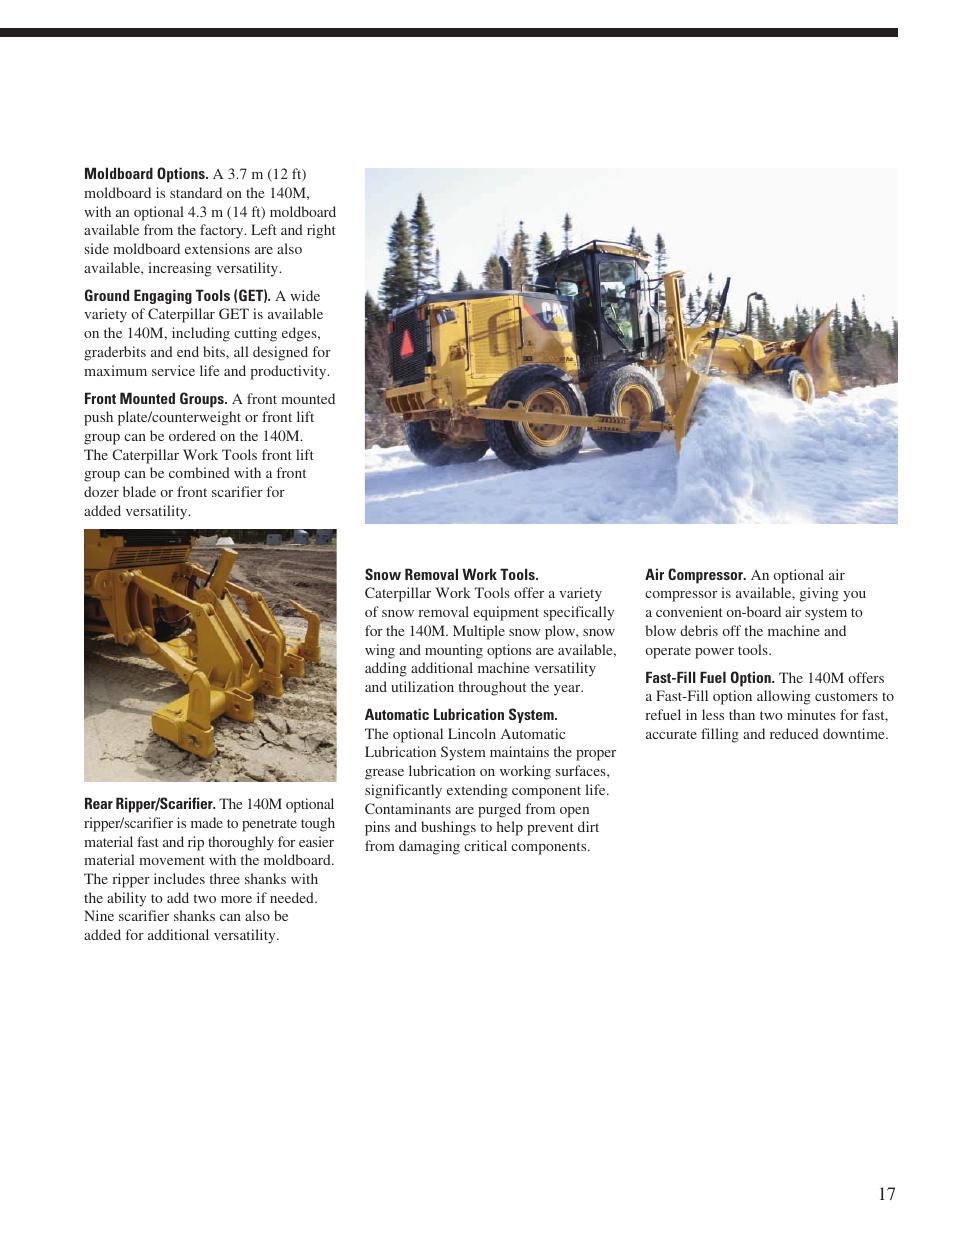 Milton CAT 140M User Manual   Page 17 / 28